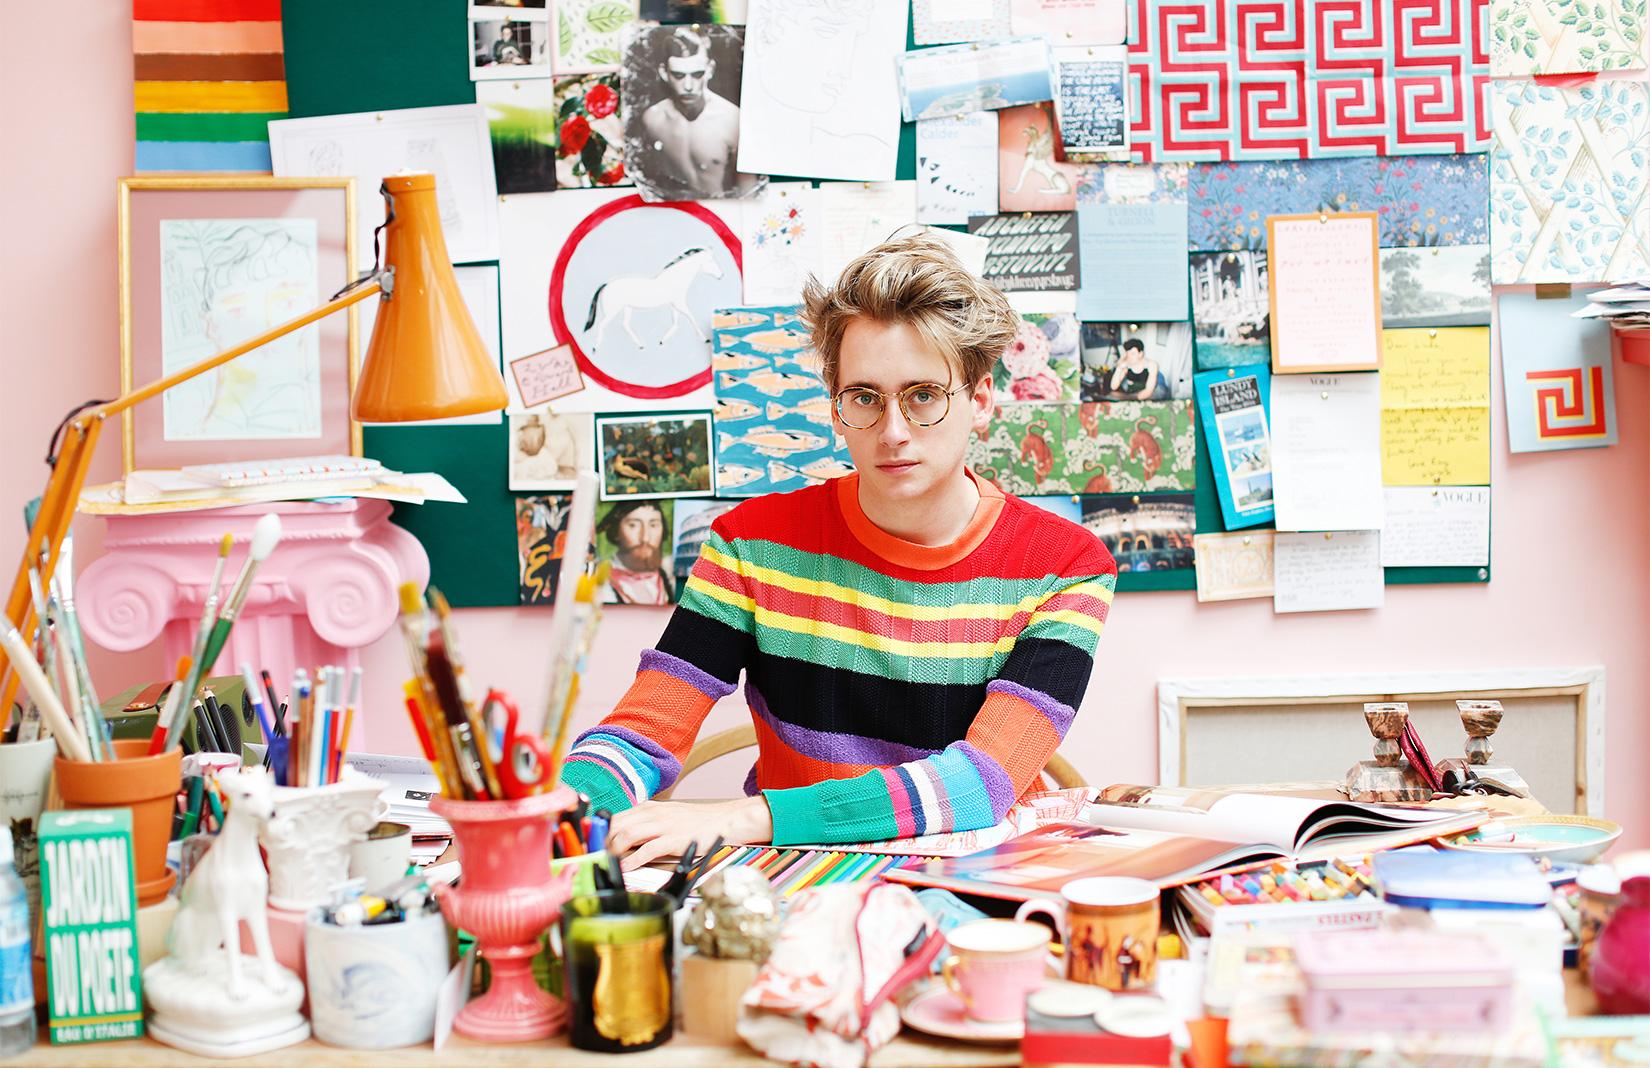 Maximalist designer Luke Edward Hall